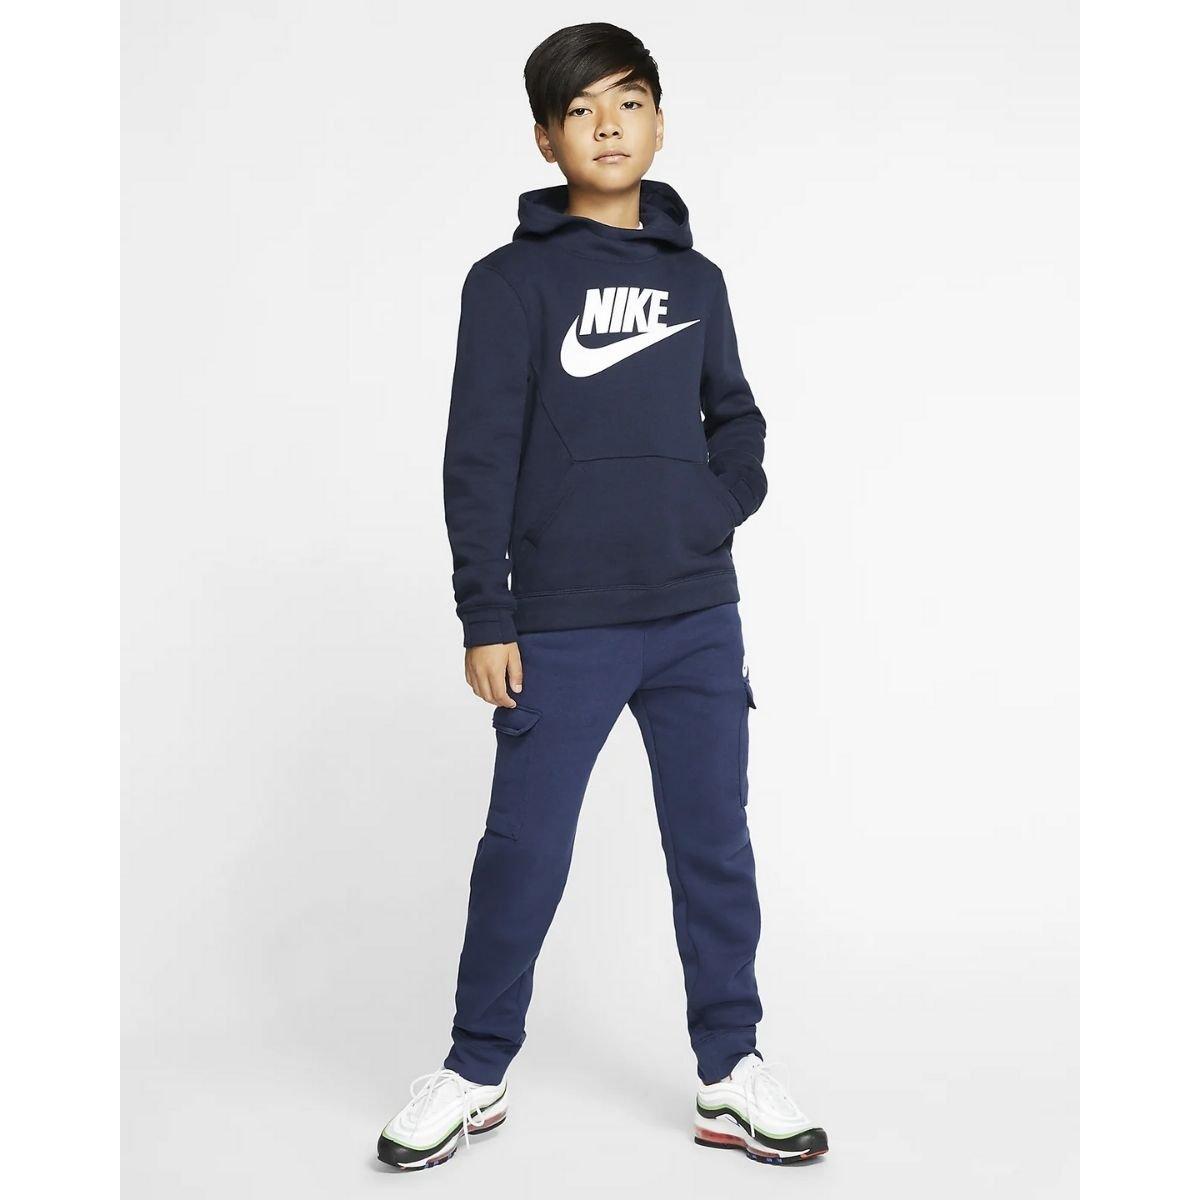 Pantalone Nike Cargo...